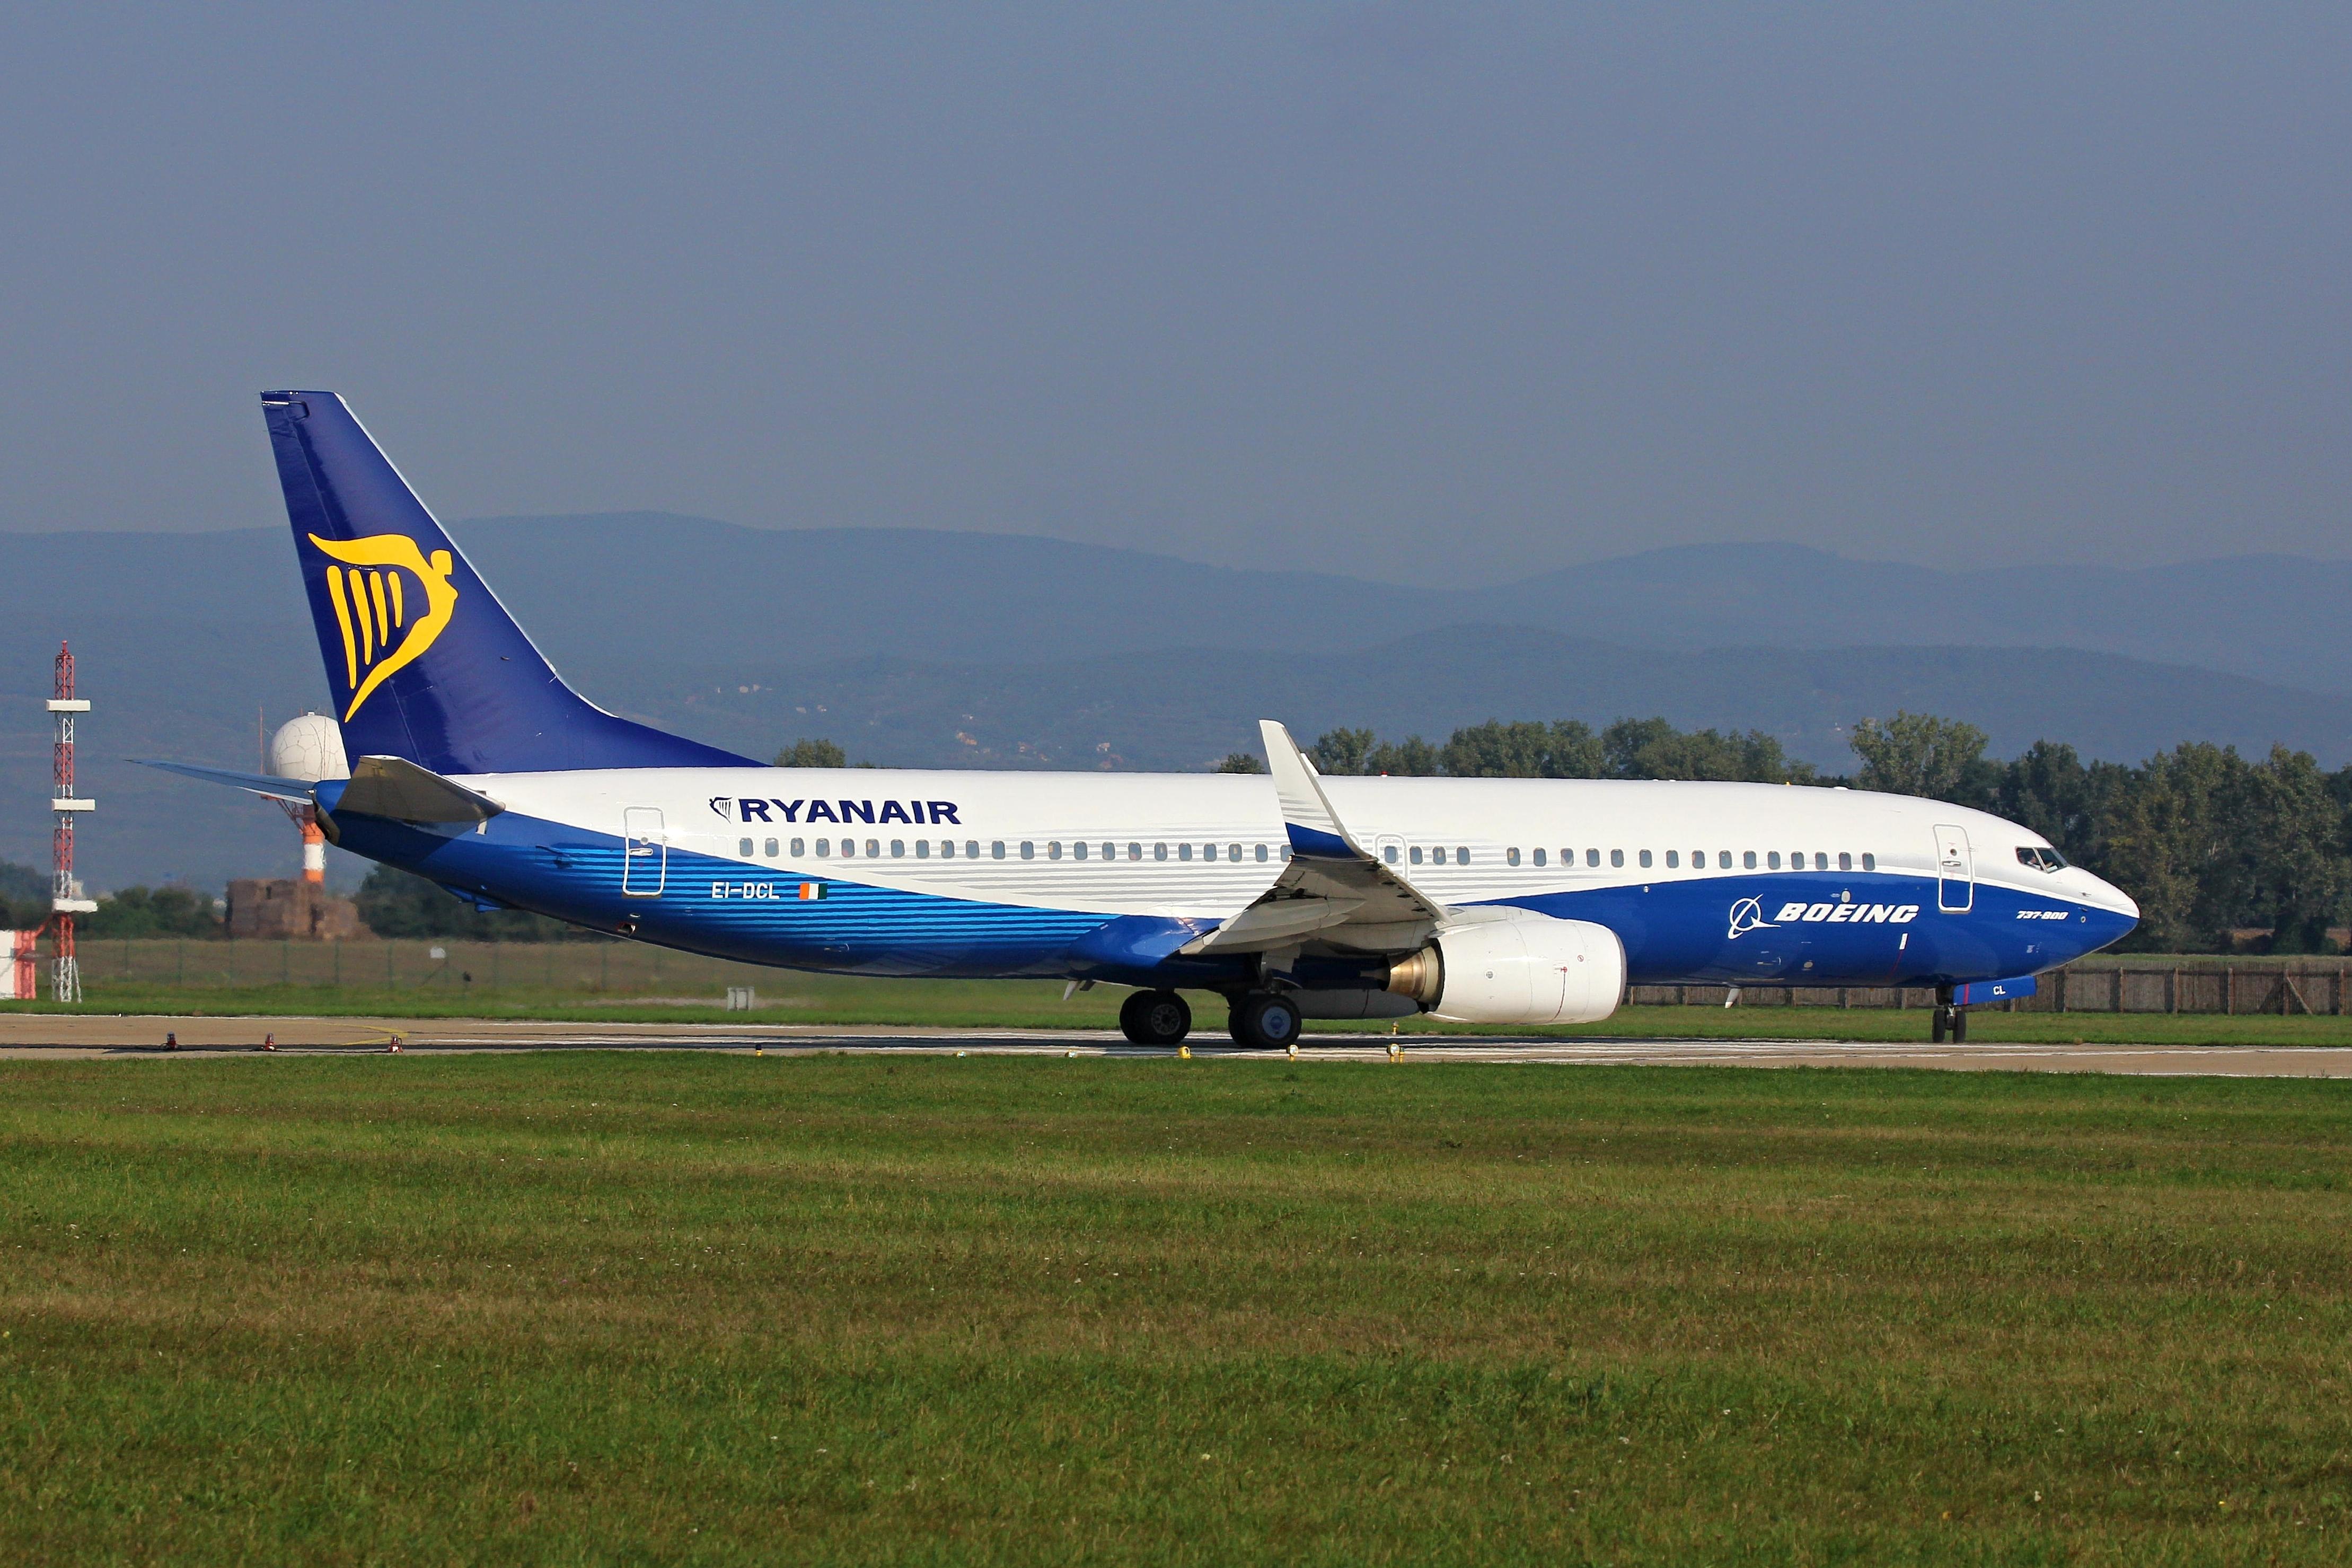 Ryanair Boeing 737-8AS(WL); reg. EI-DCL; cn: 33806